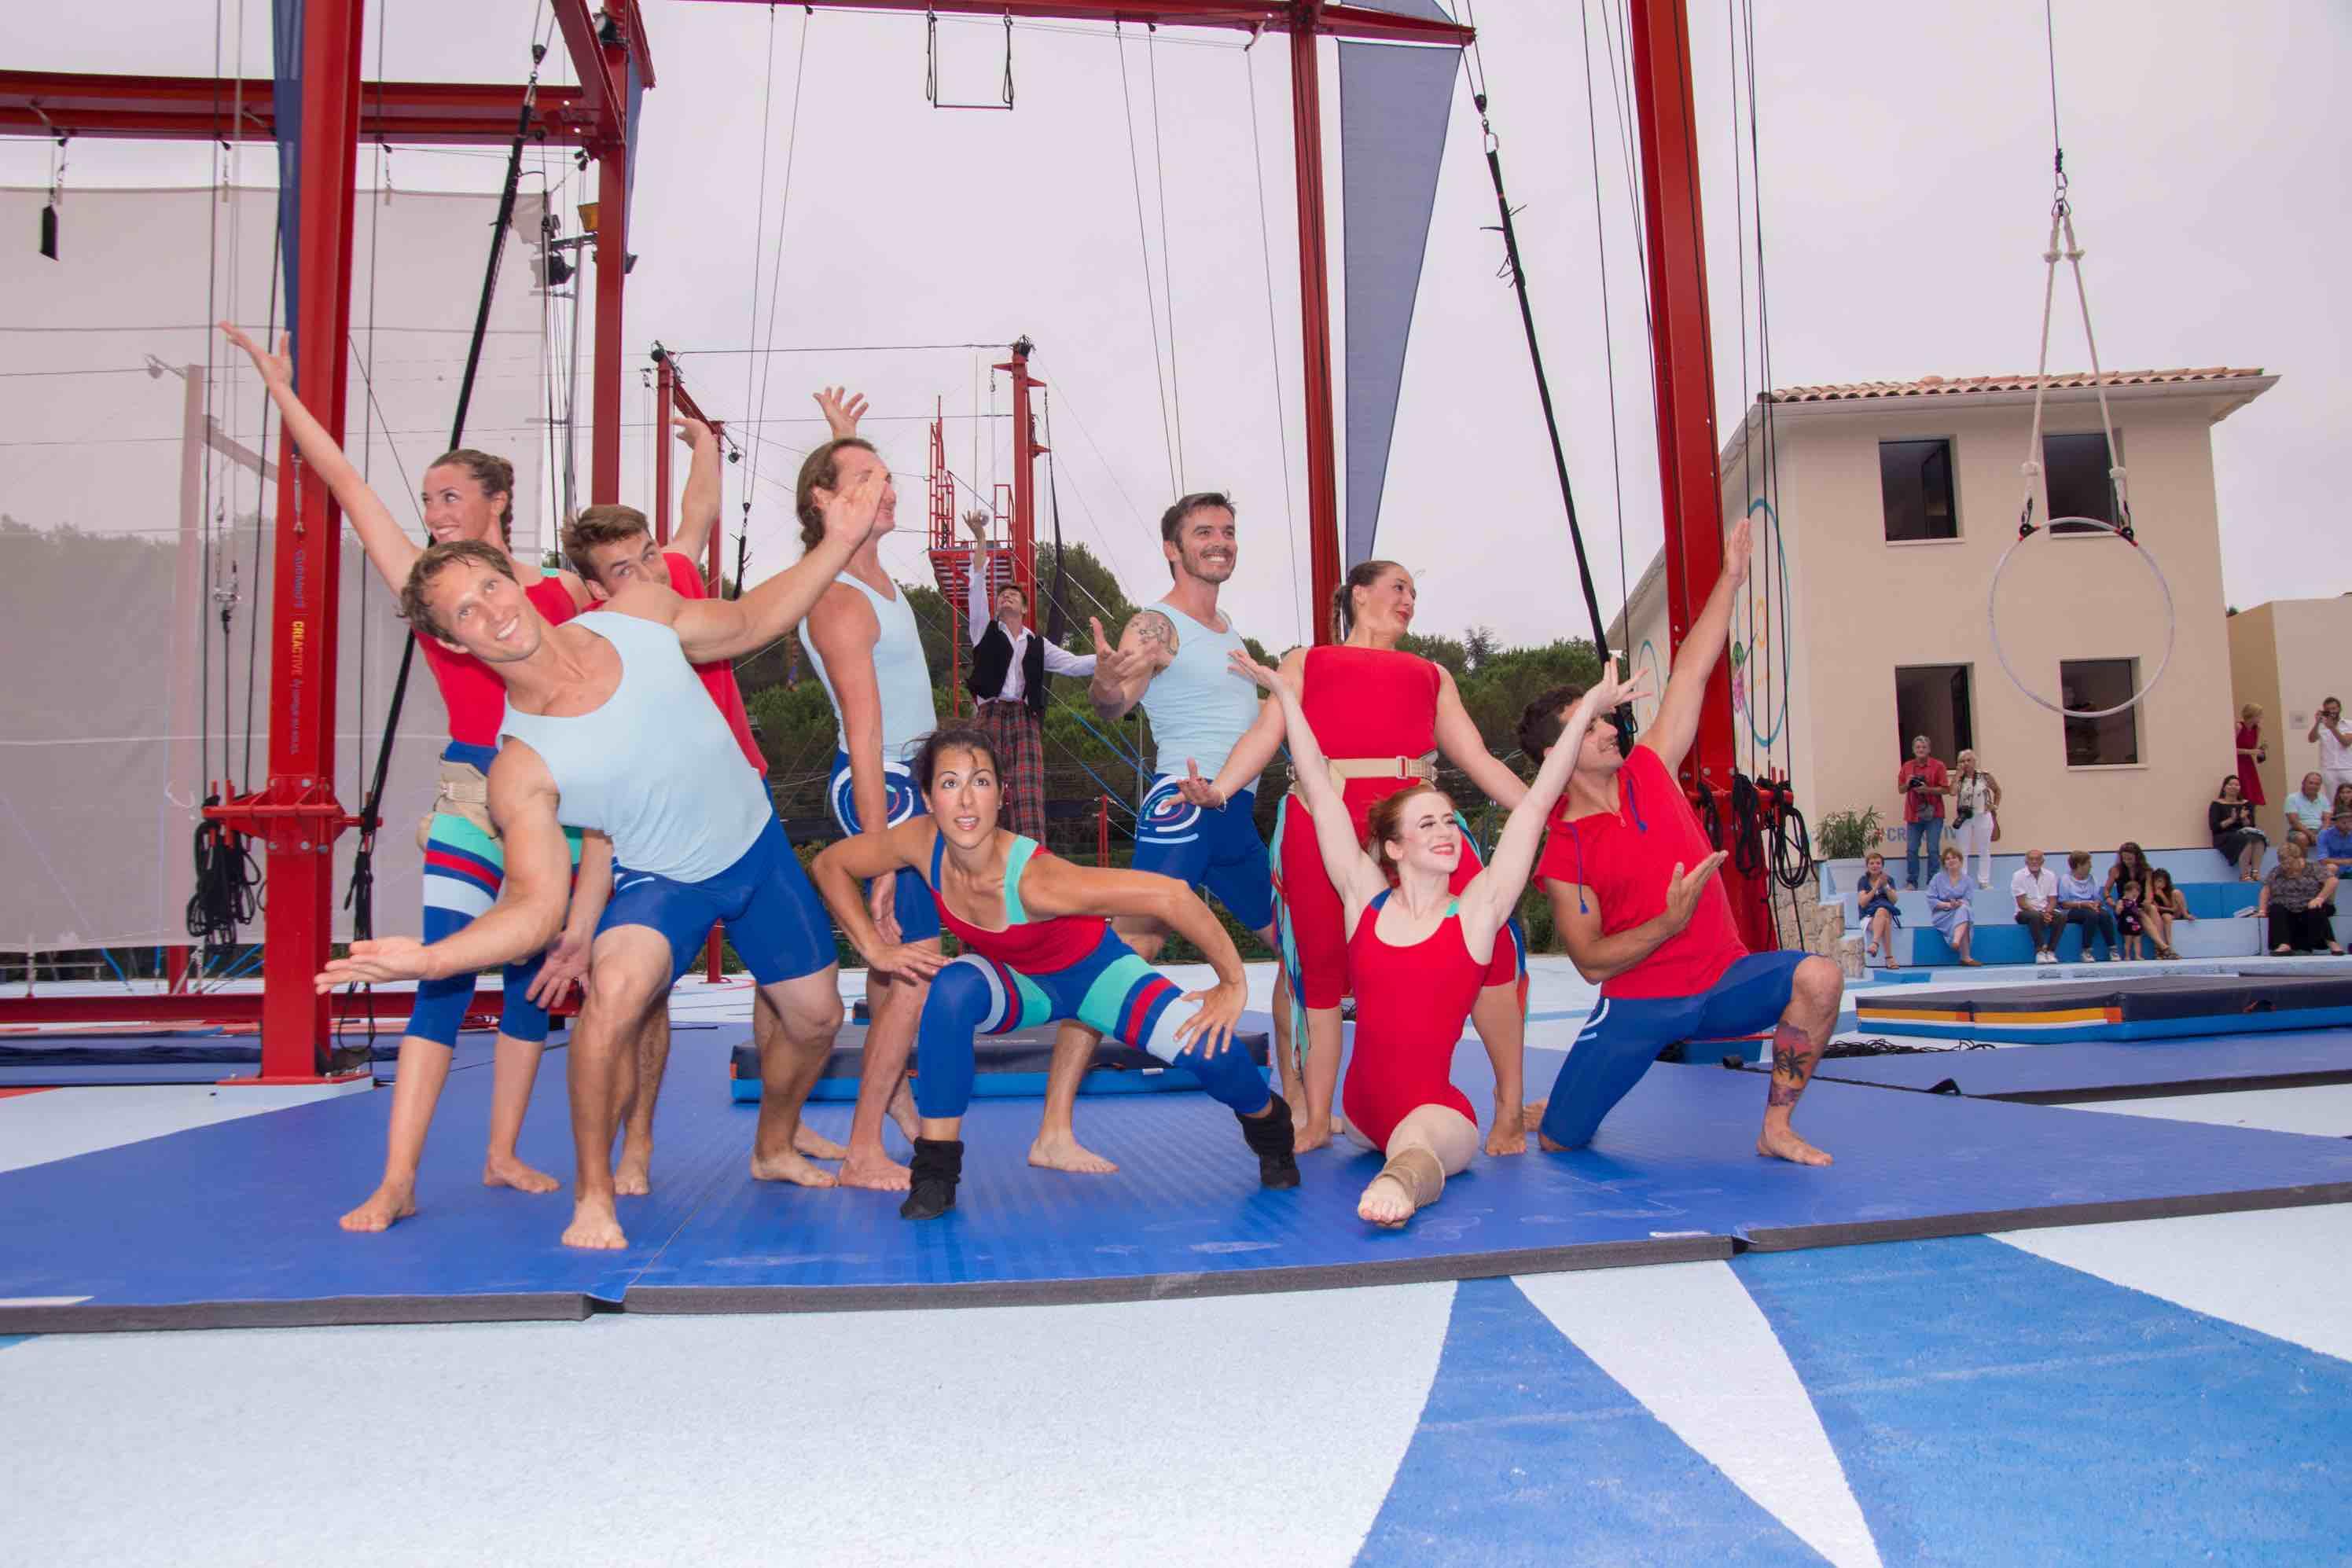 Creactive by Cirque du Soleil